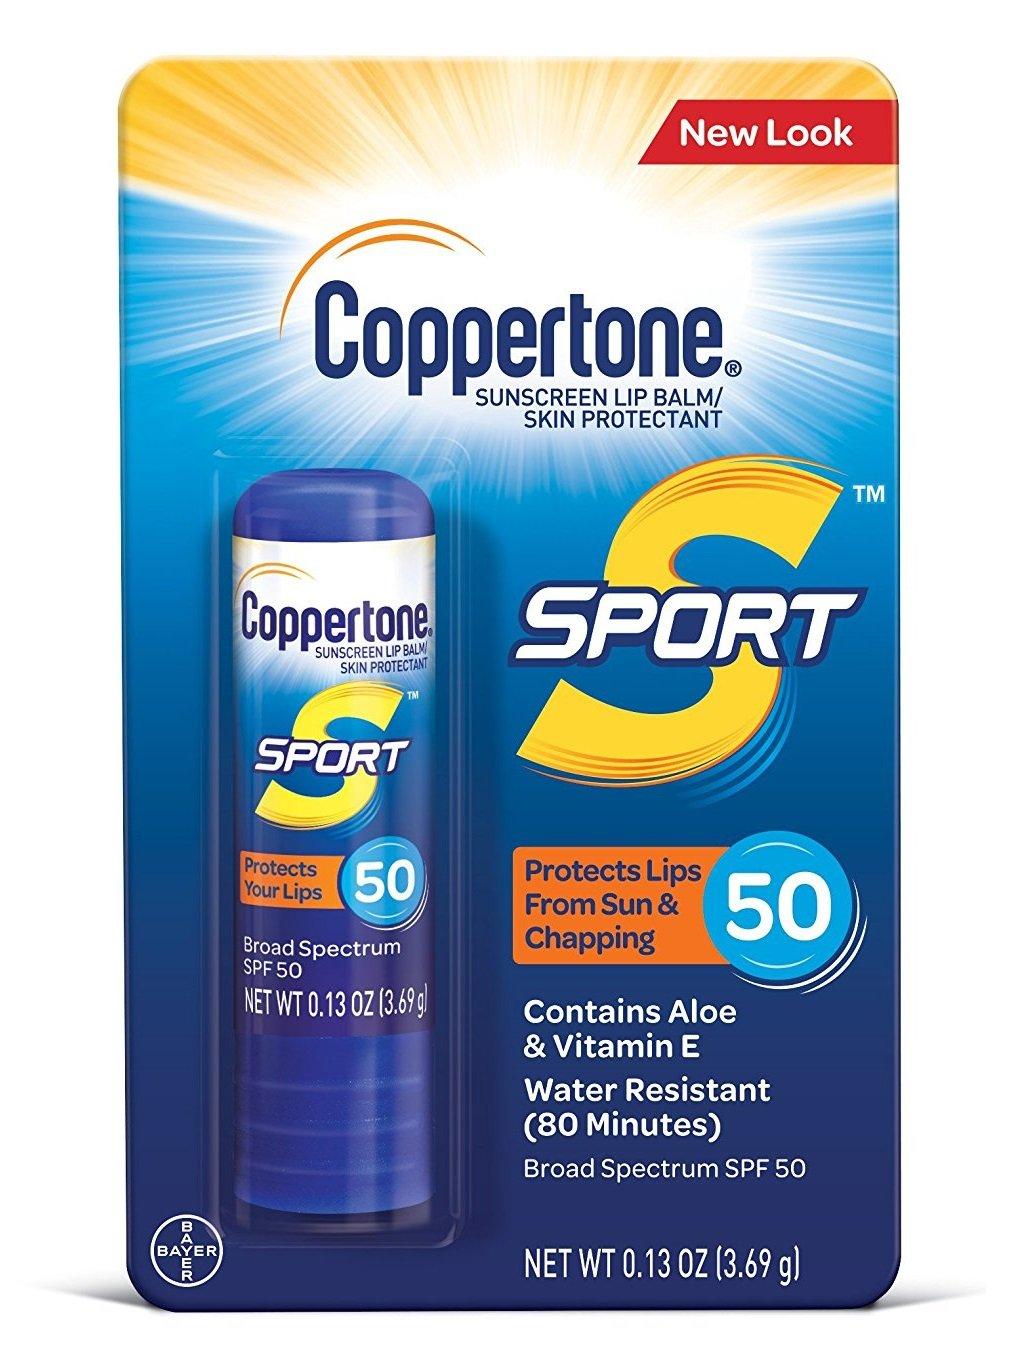 Coppertone Sport Sunscreen Lip Balm/Skin Protectant SPF 50 - .13 oz, Pack of 4 BAYER CONSUMER - SUNCARE